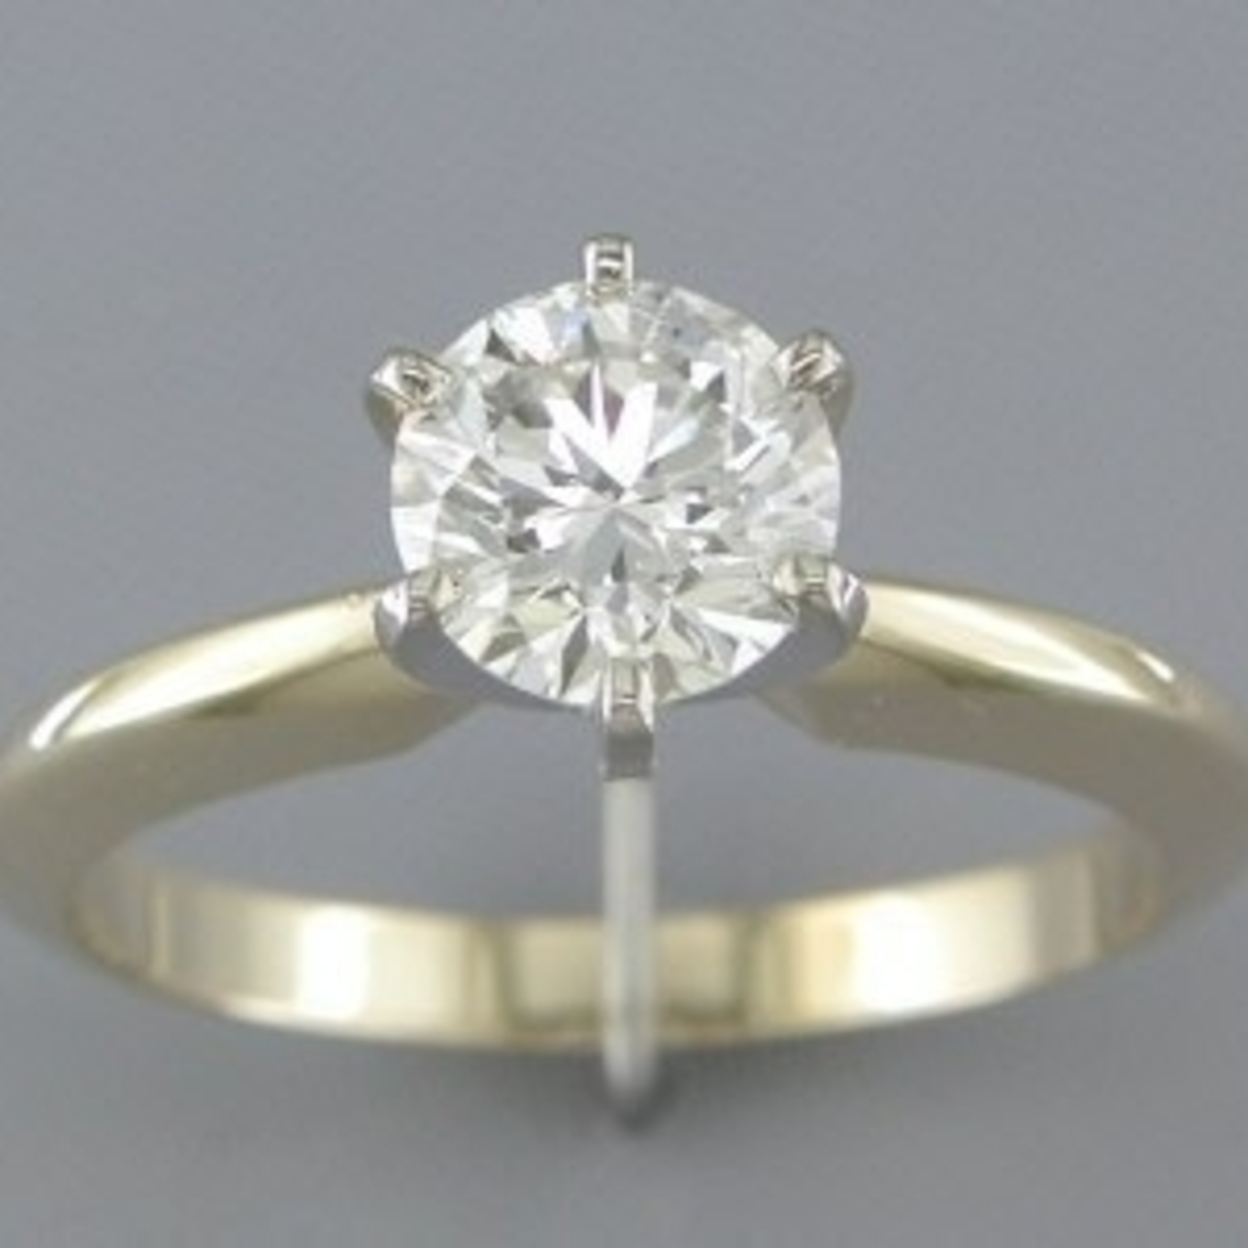 Egl Cert 1.03 Diamond Solitaire Ring Style R23218